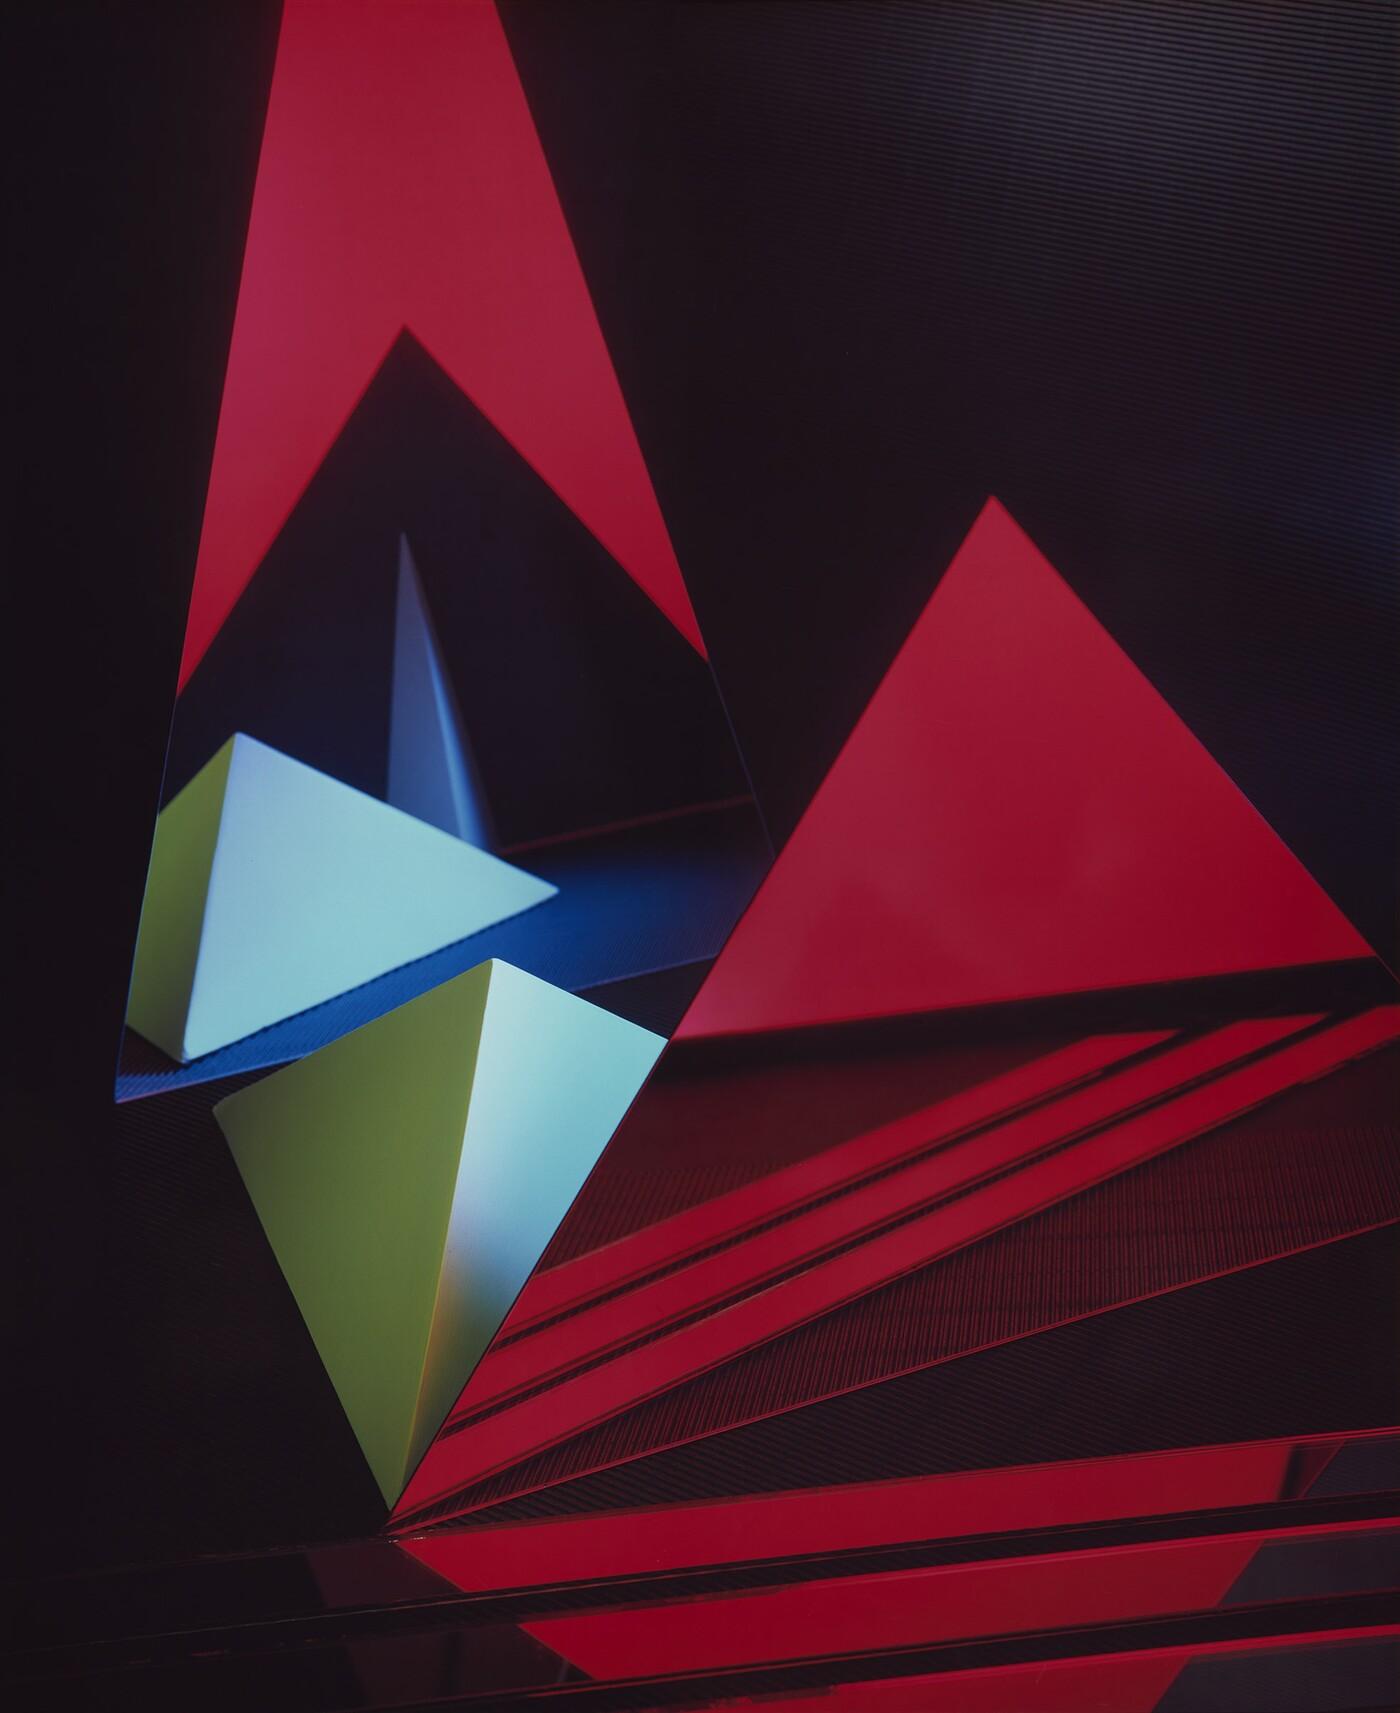 Barbara Kasten (b. 1936), Construct XXI, 1983, Dye diffusion transfer print